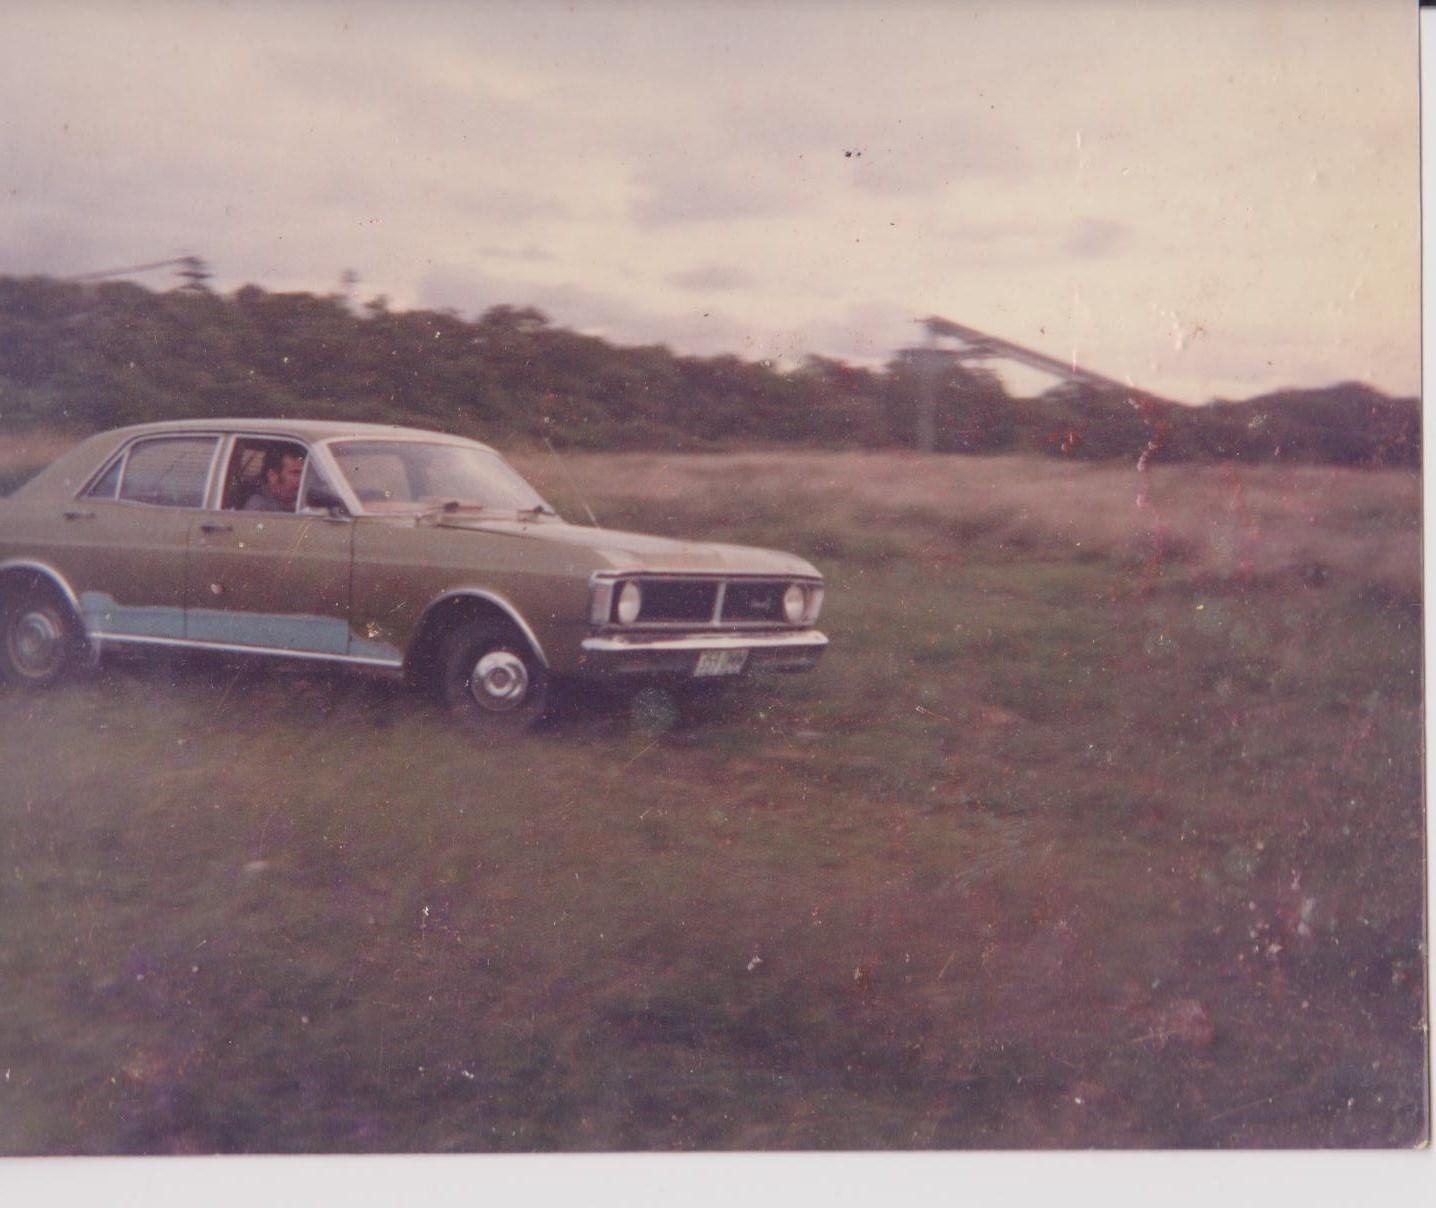 1971 Ford Xy Fairmont Bigcarle Shannons Club